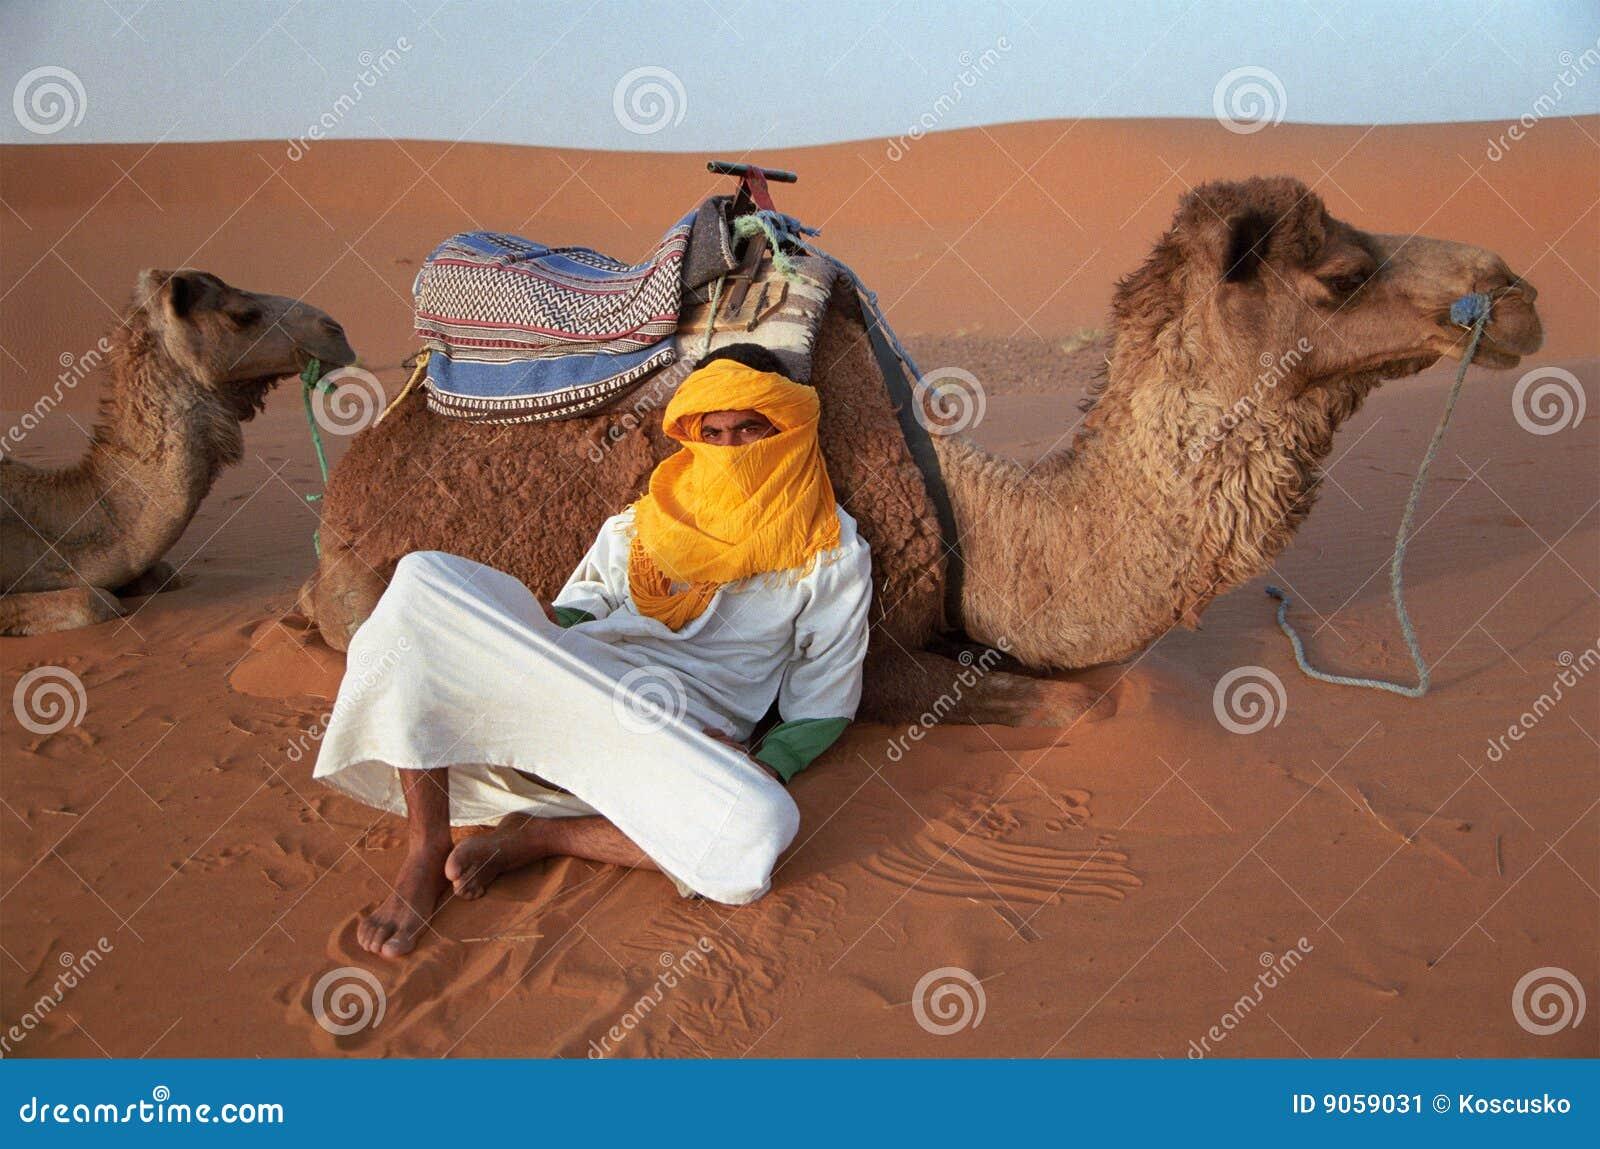 Berber guide rests